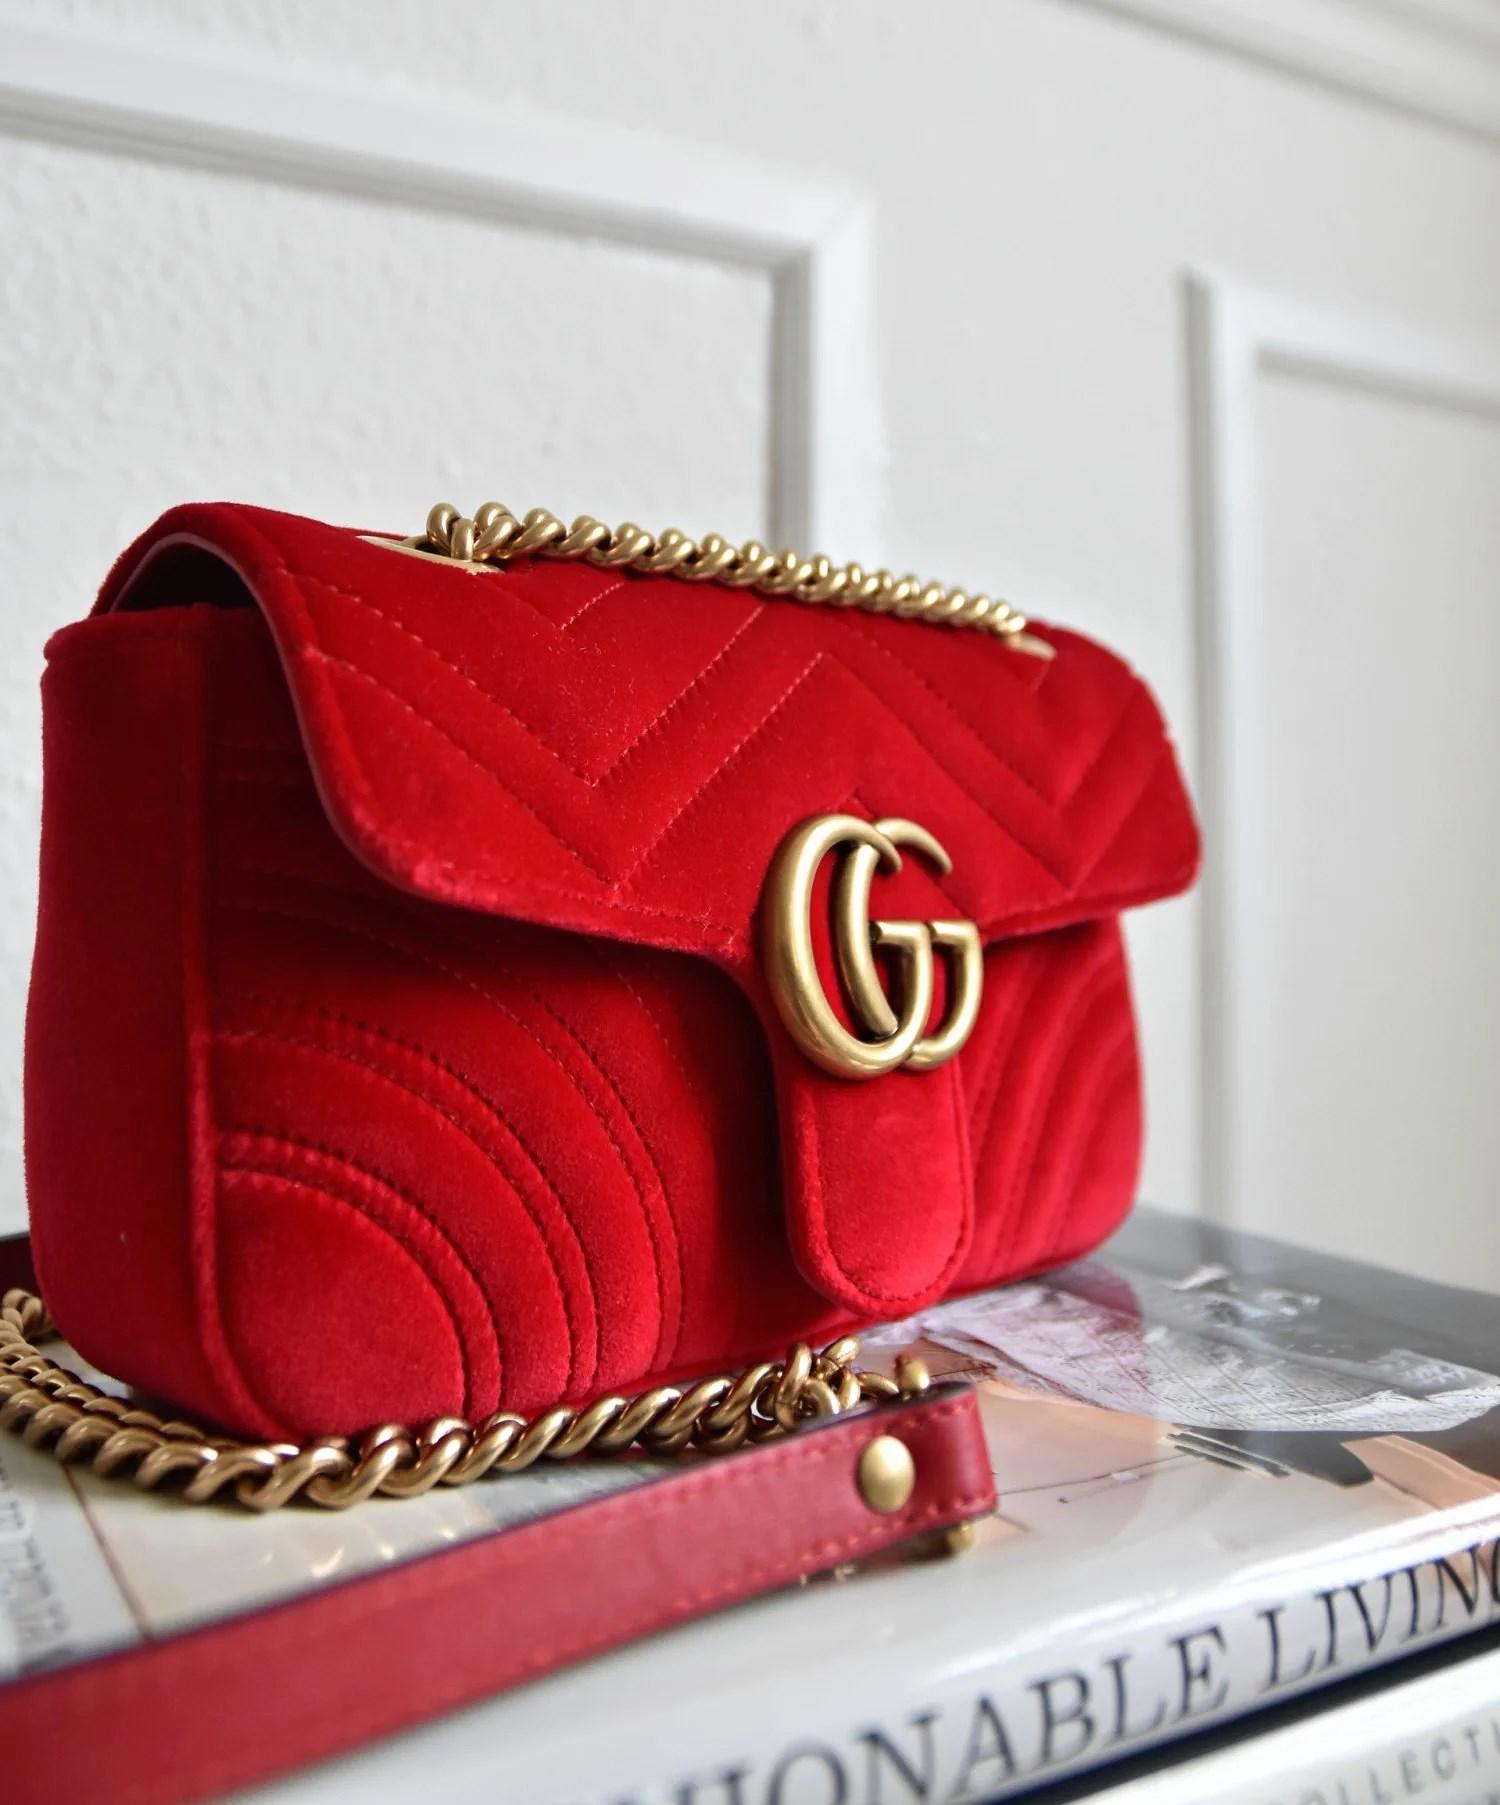 gucci-velvet-red-bag-gold